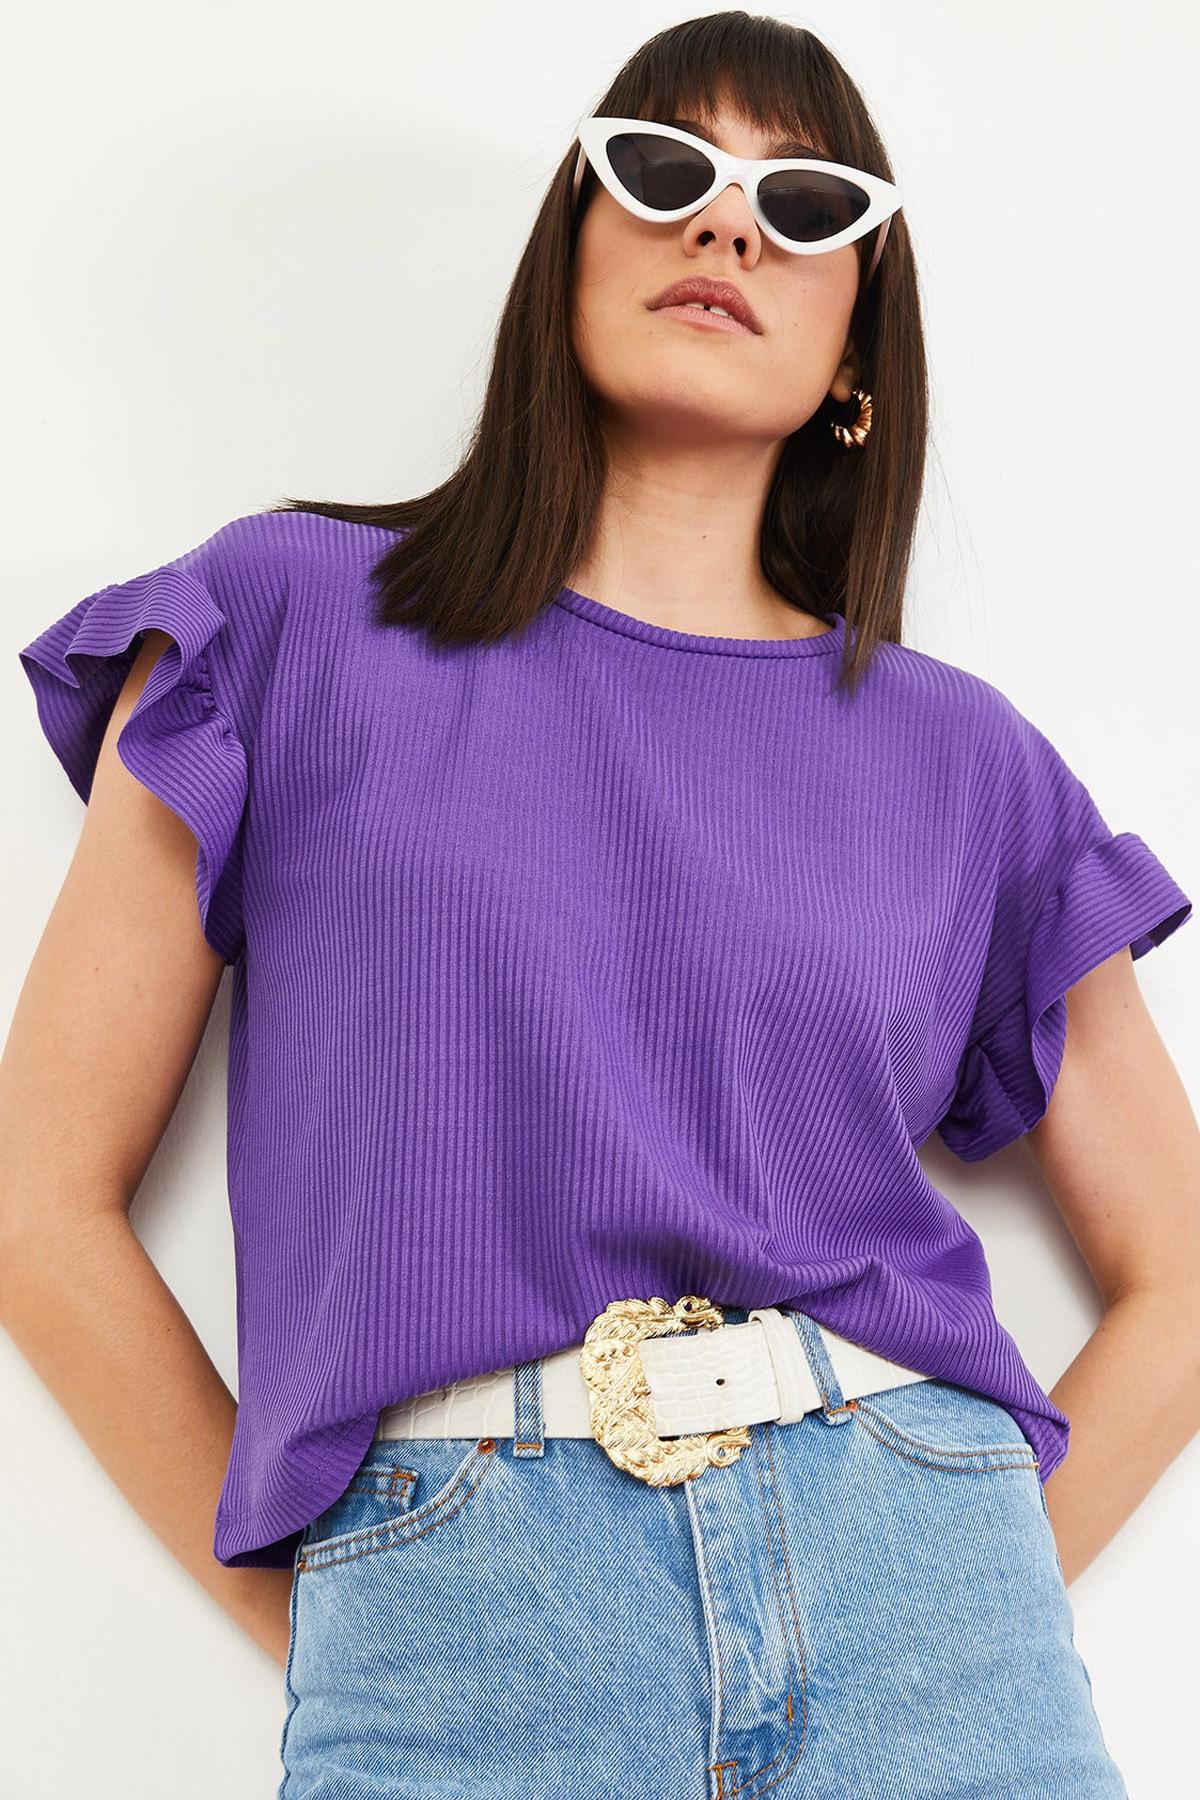 Bianco Lucci Kadın Mor Kolu Fırfırlı Kaşkorse Bluz 10051015 3